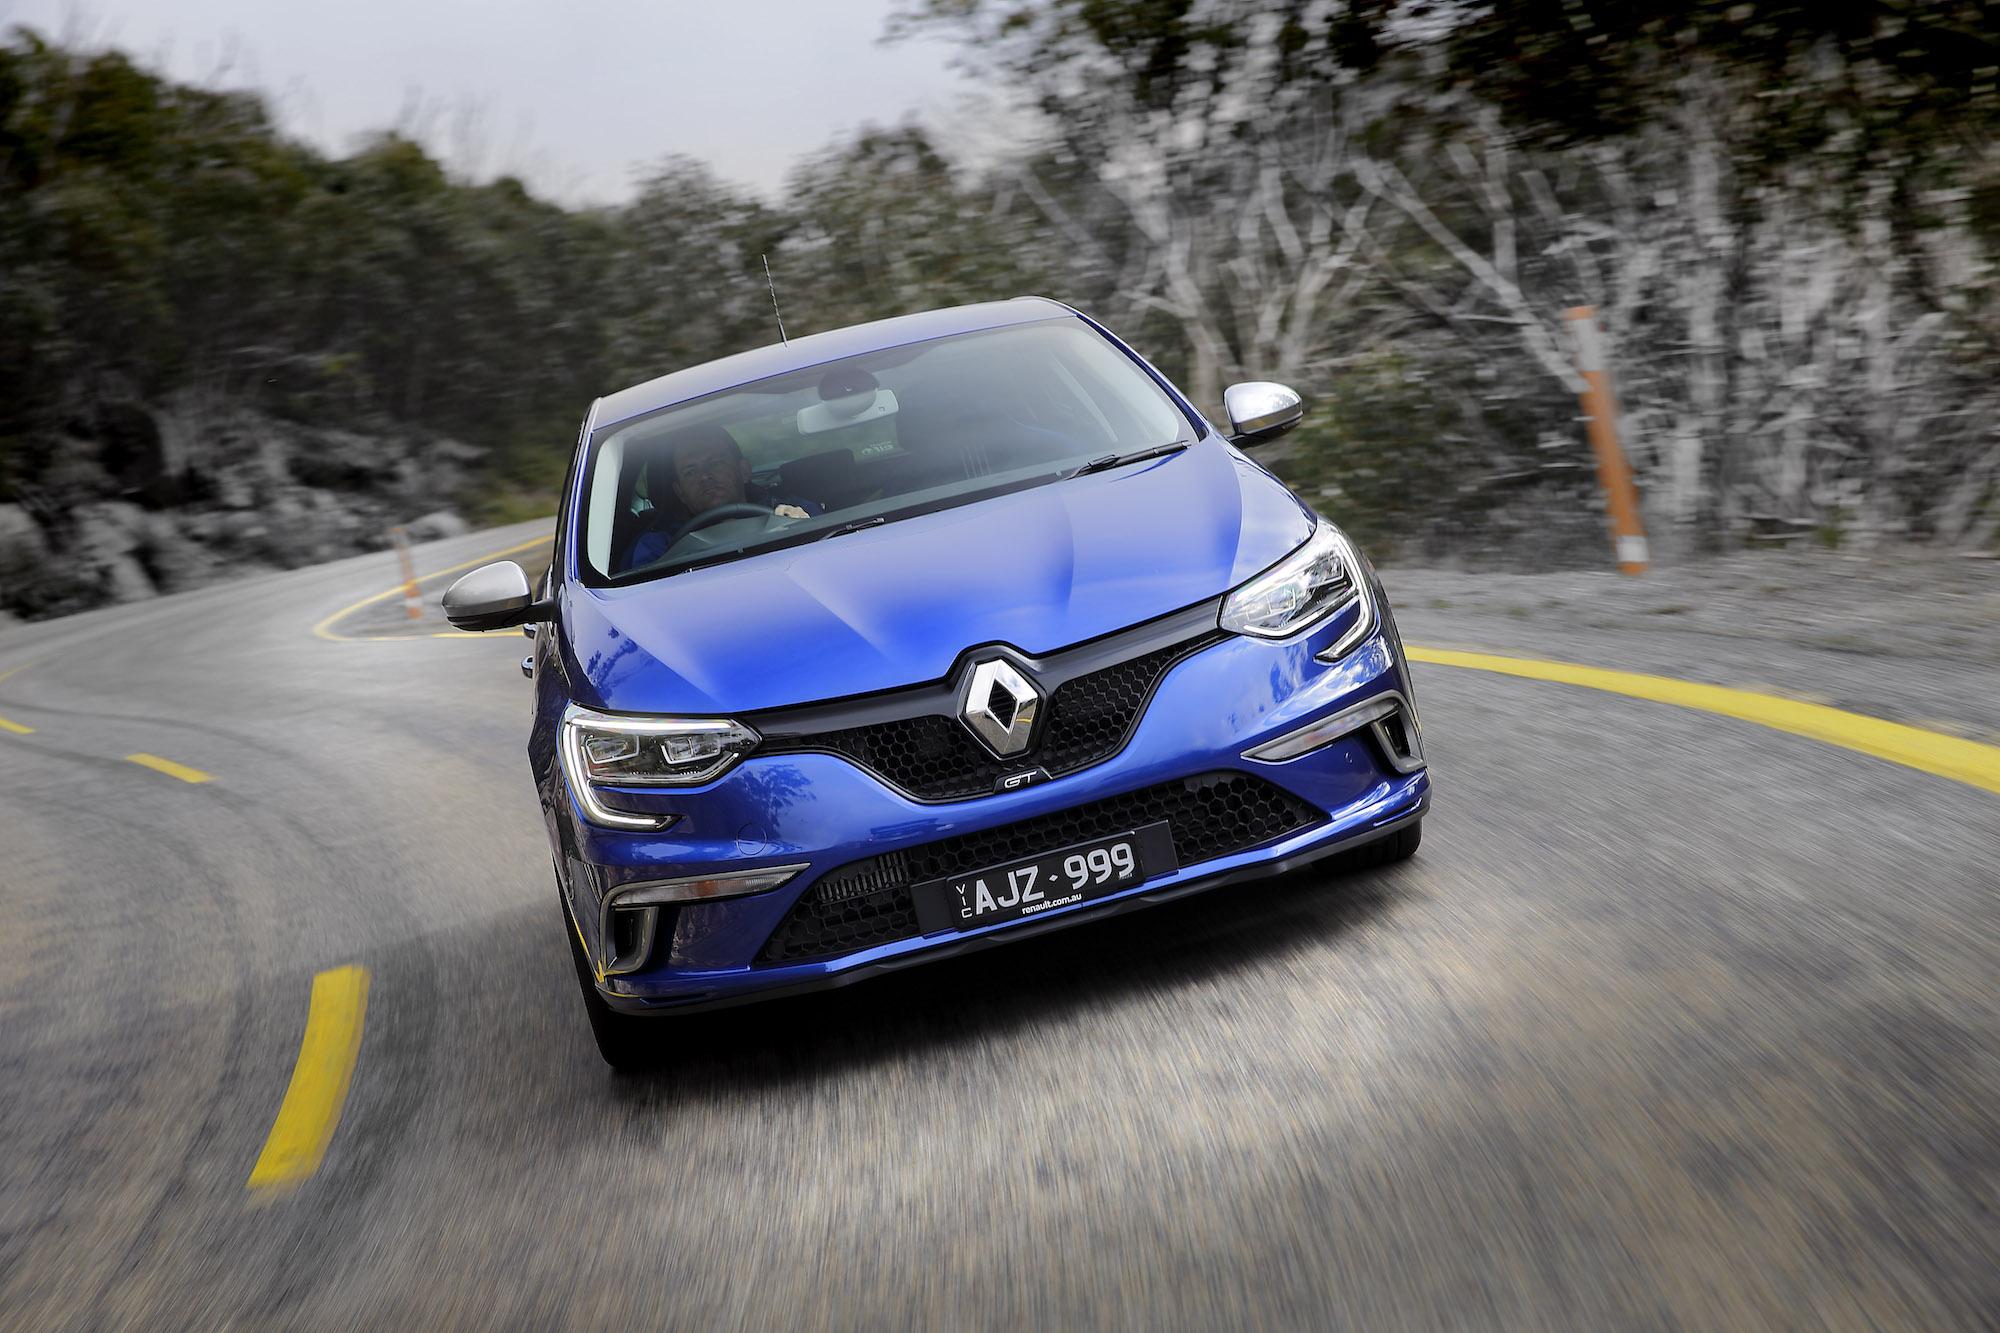 Renault Megane GT photo 170361